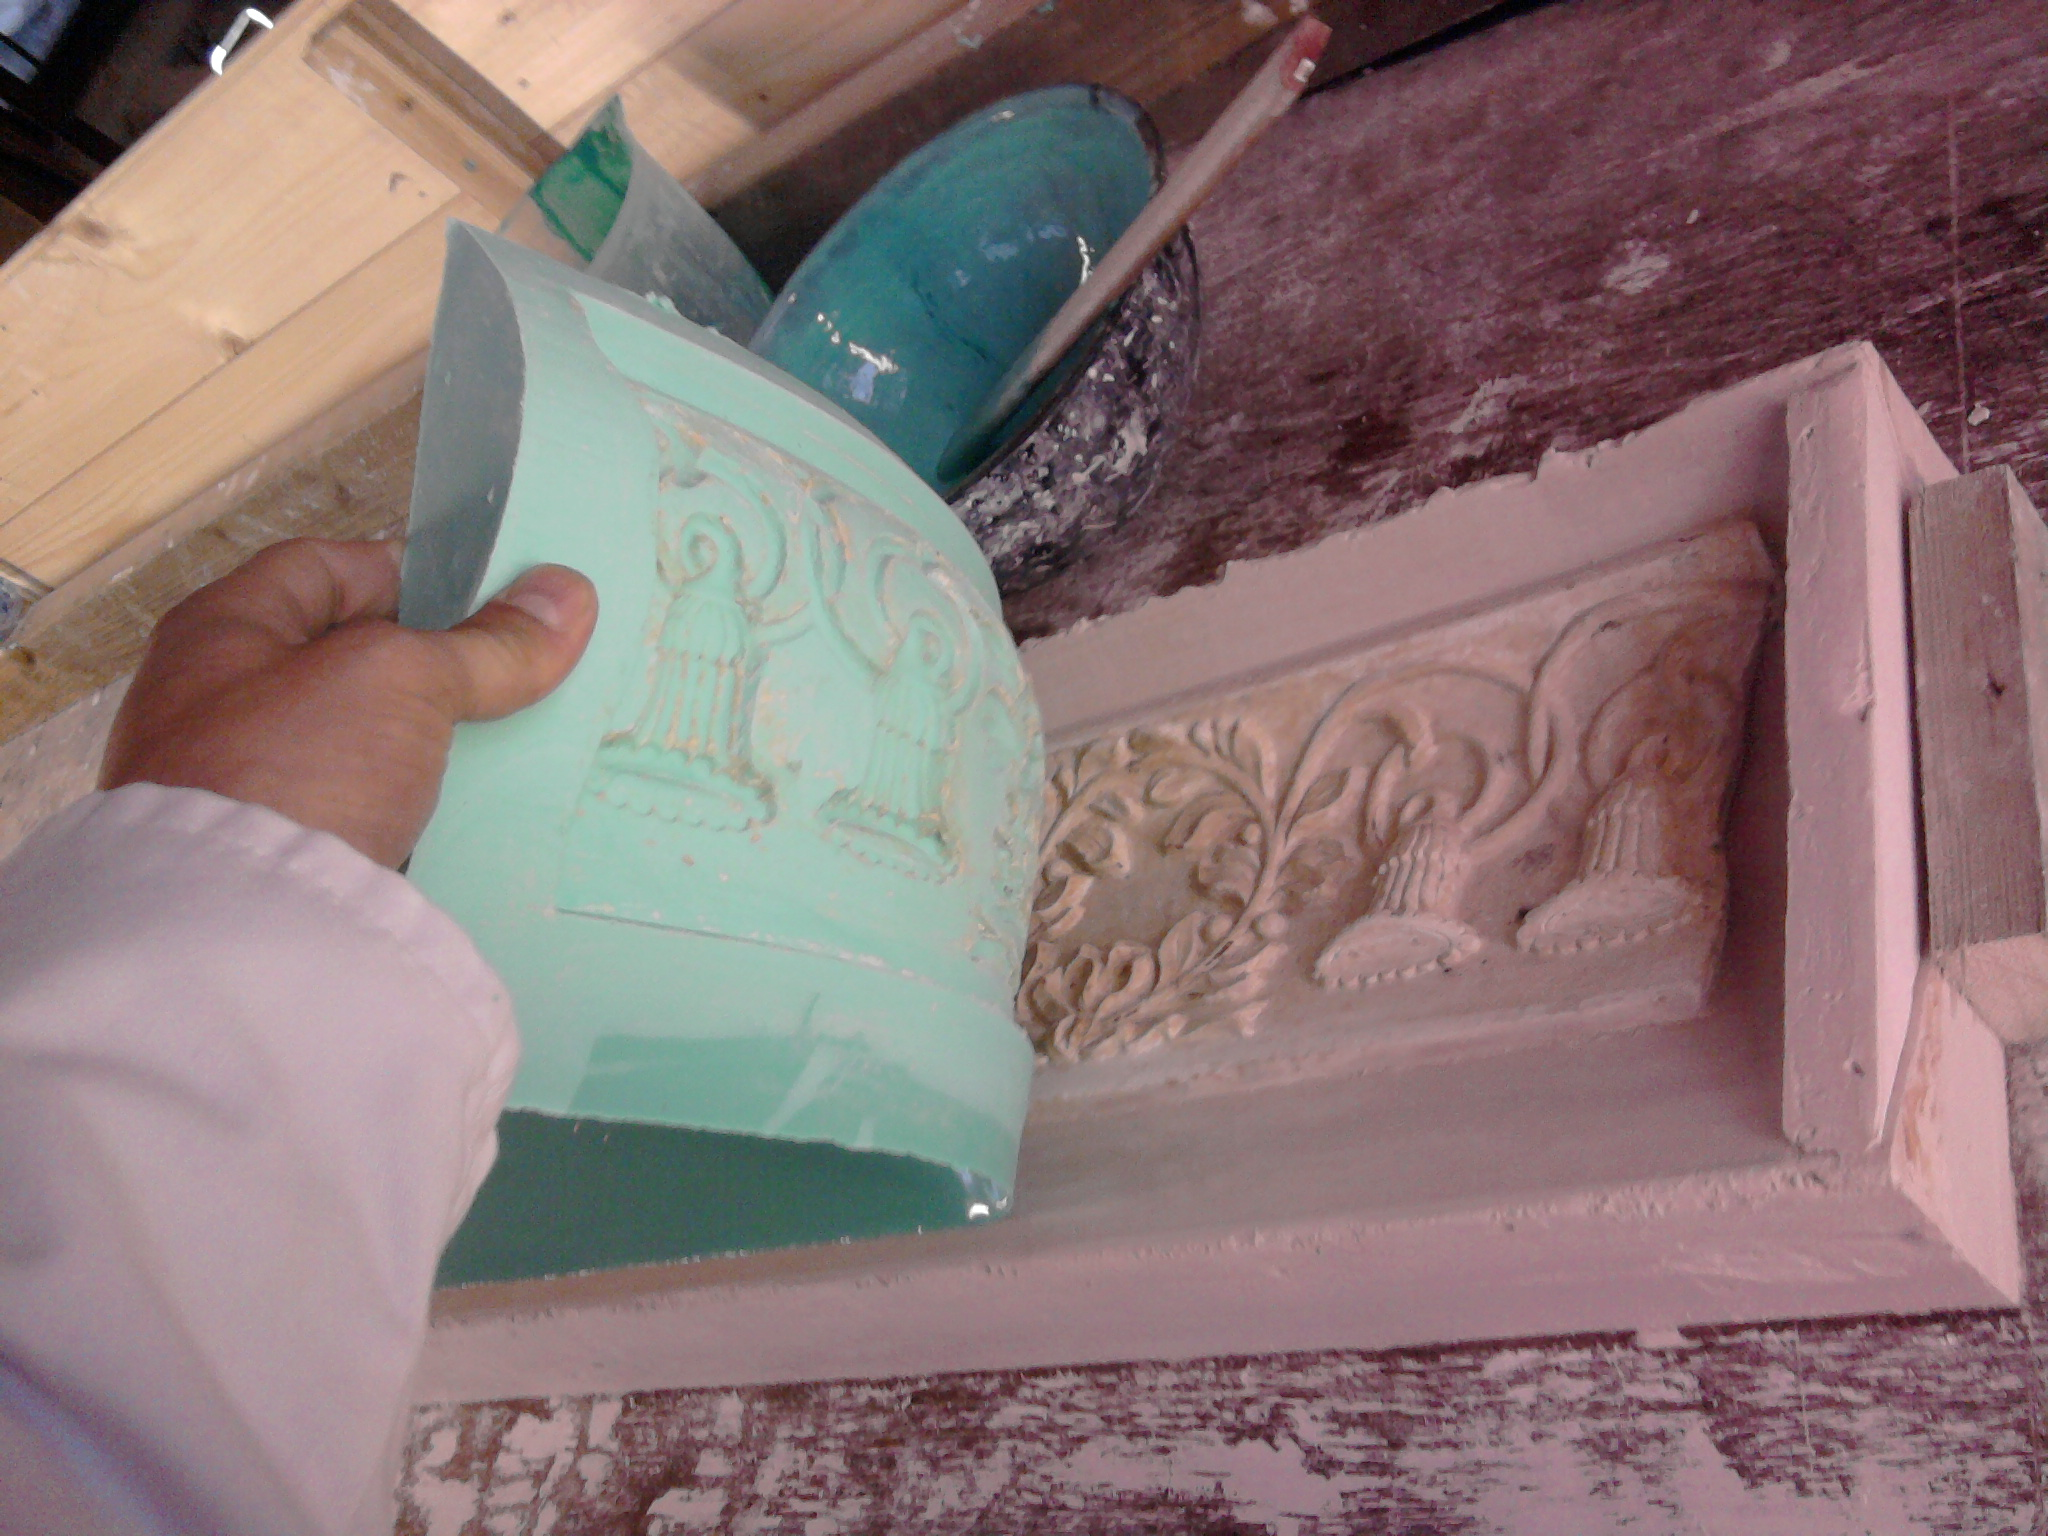 cornice insert detail